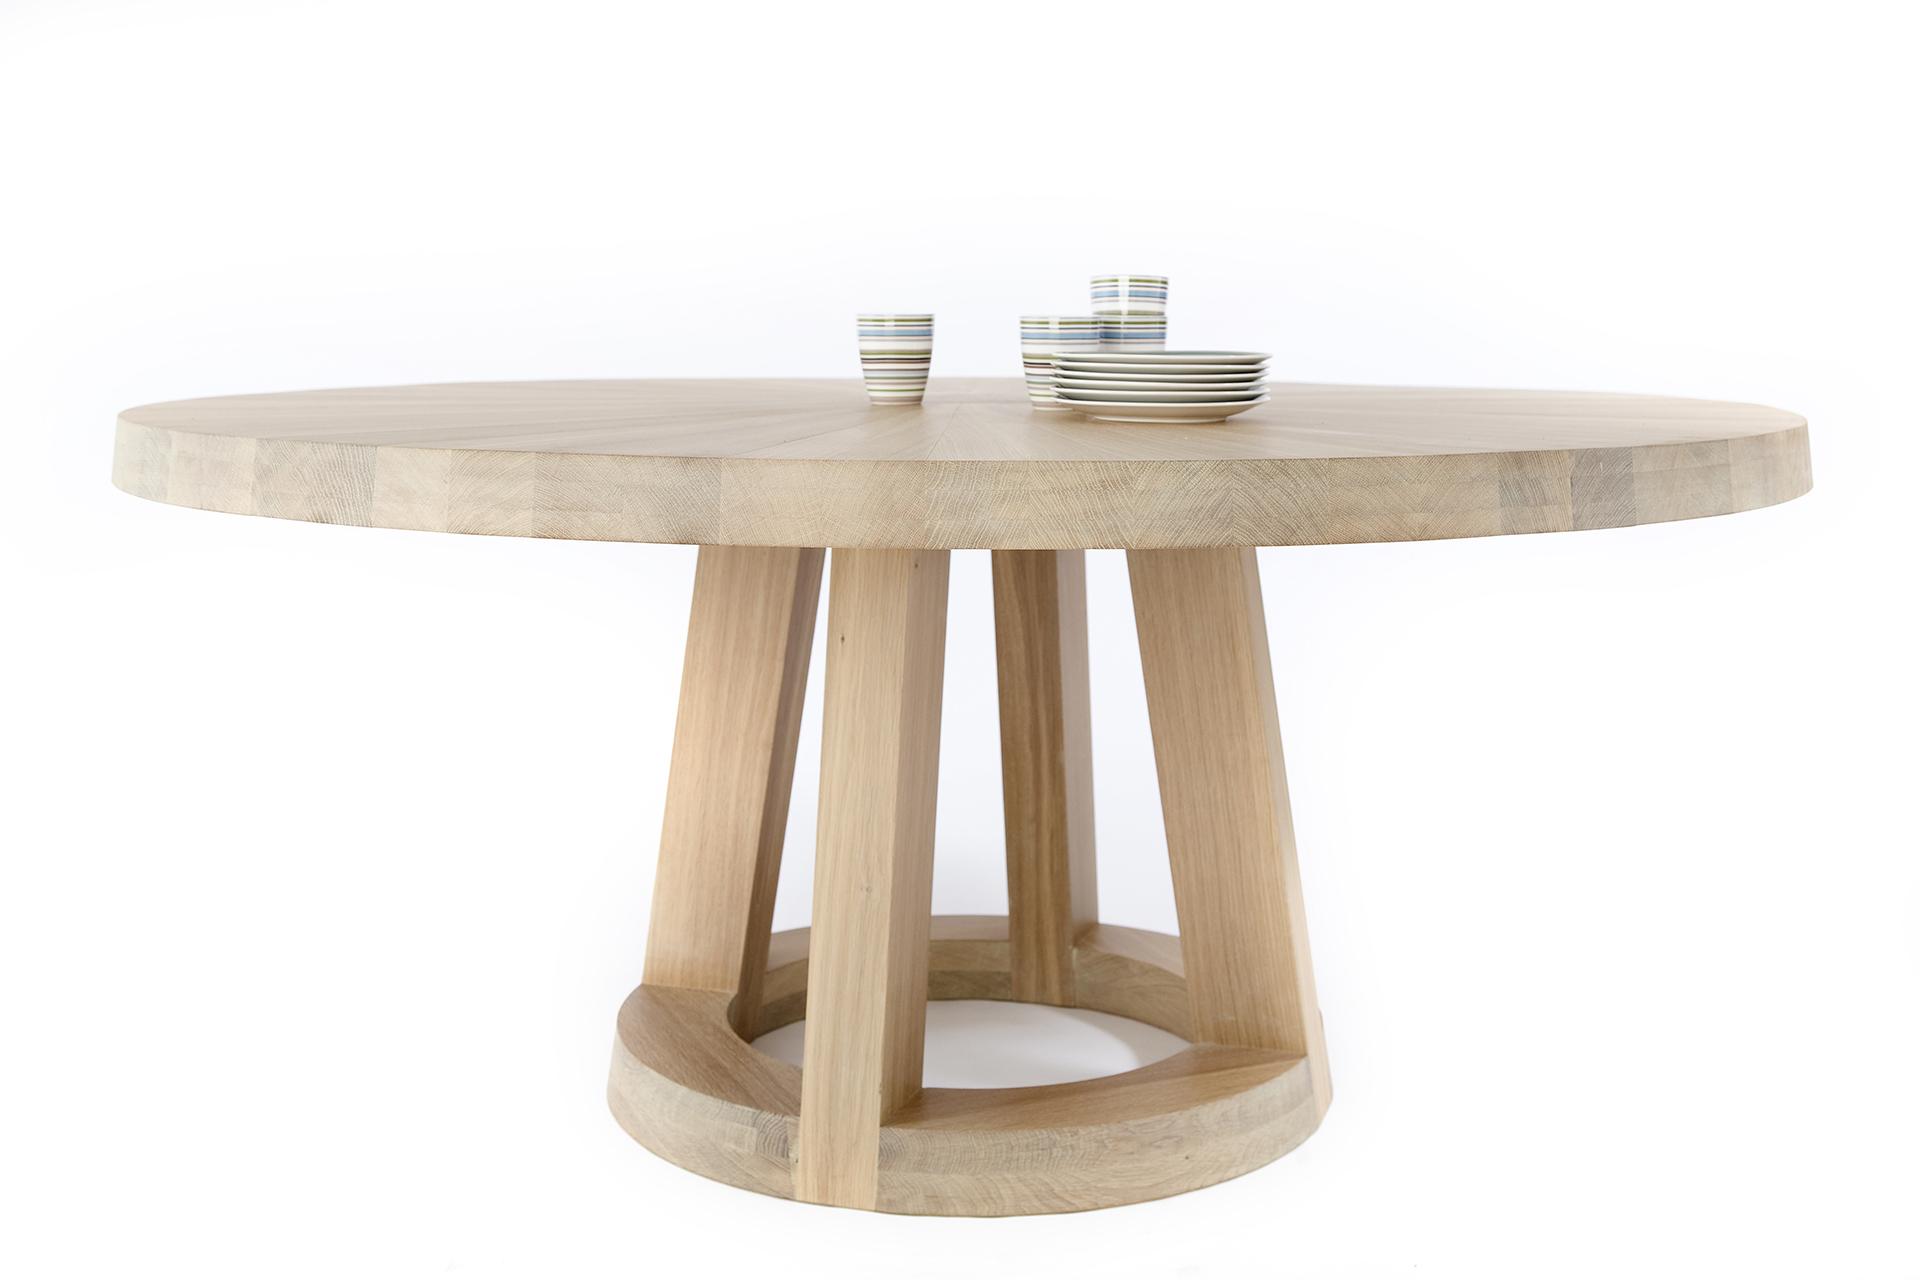 Ronde Tafel 170.Solid Ronde Design Tafel L Remy Meijers L Odesi Your Dutch Design